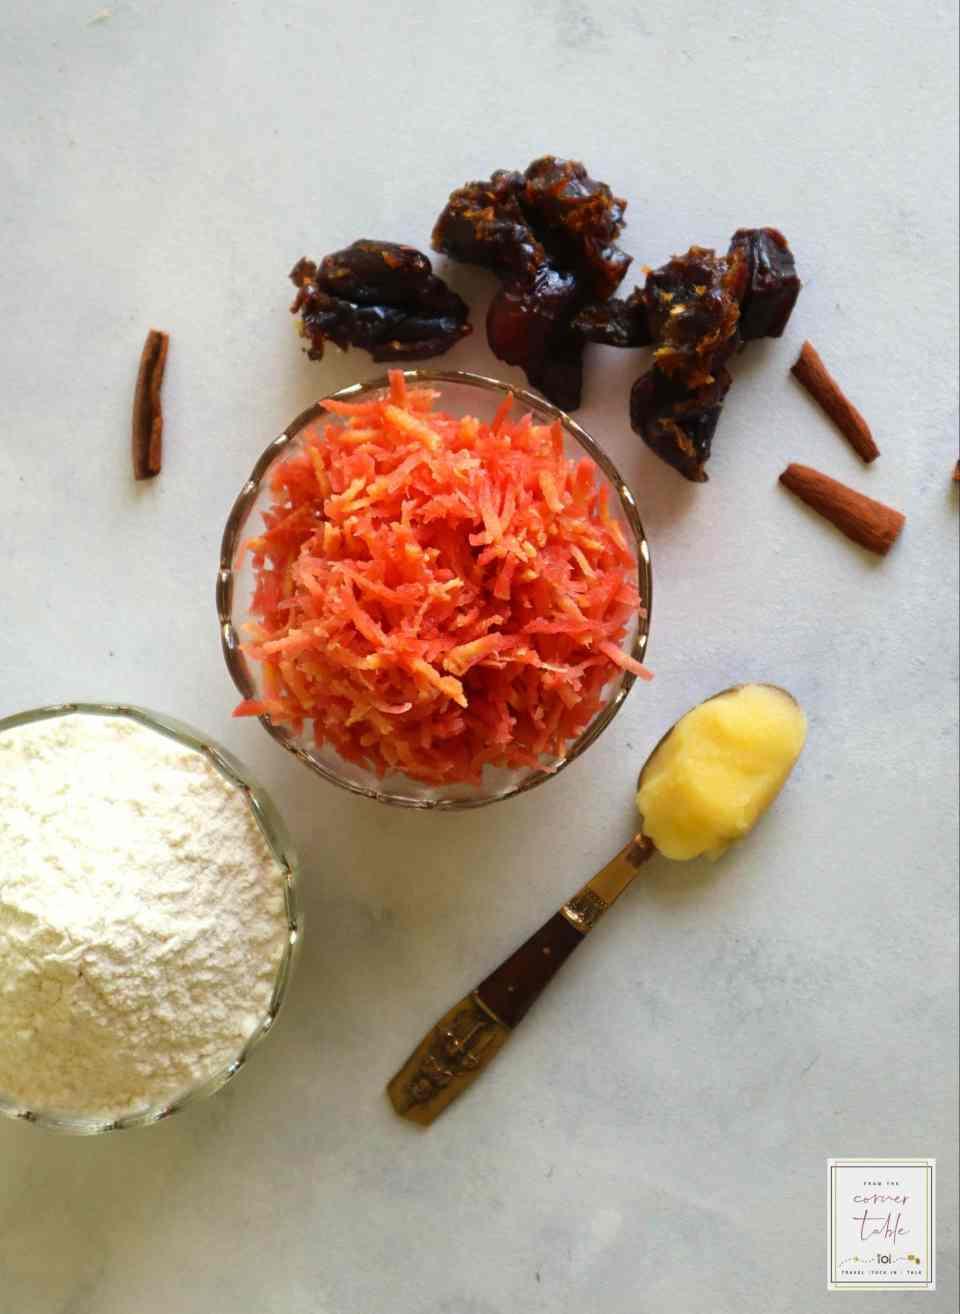 gajar Ka halwa, carrot halwa, #indiandesert #fromthecornertable